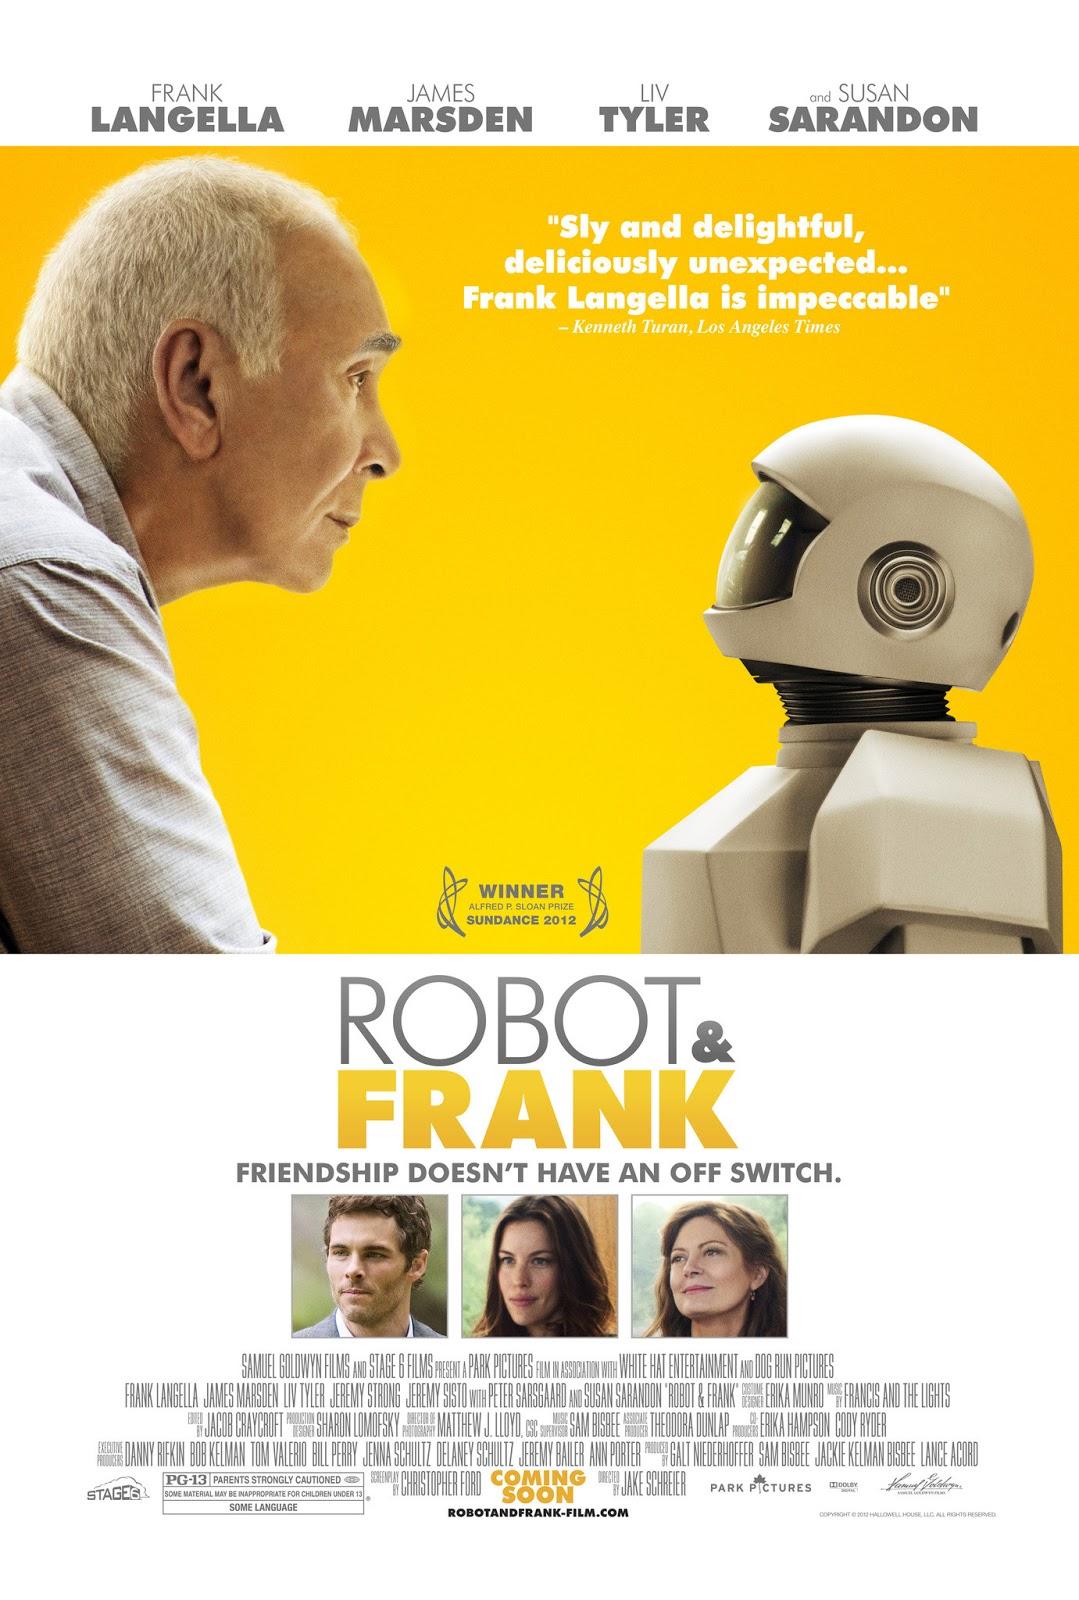 Robot & Frank 2012 একটি অসাধারণ মুভি ডাউনলোড লিঙ্ক